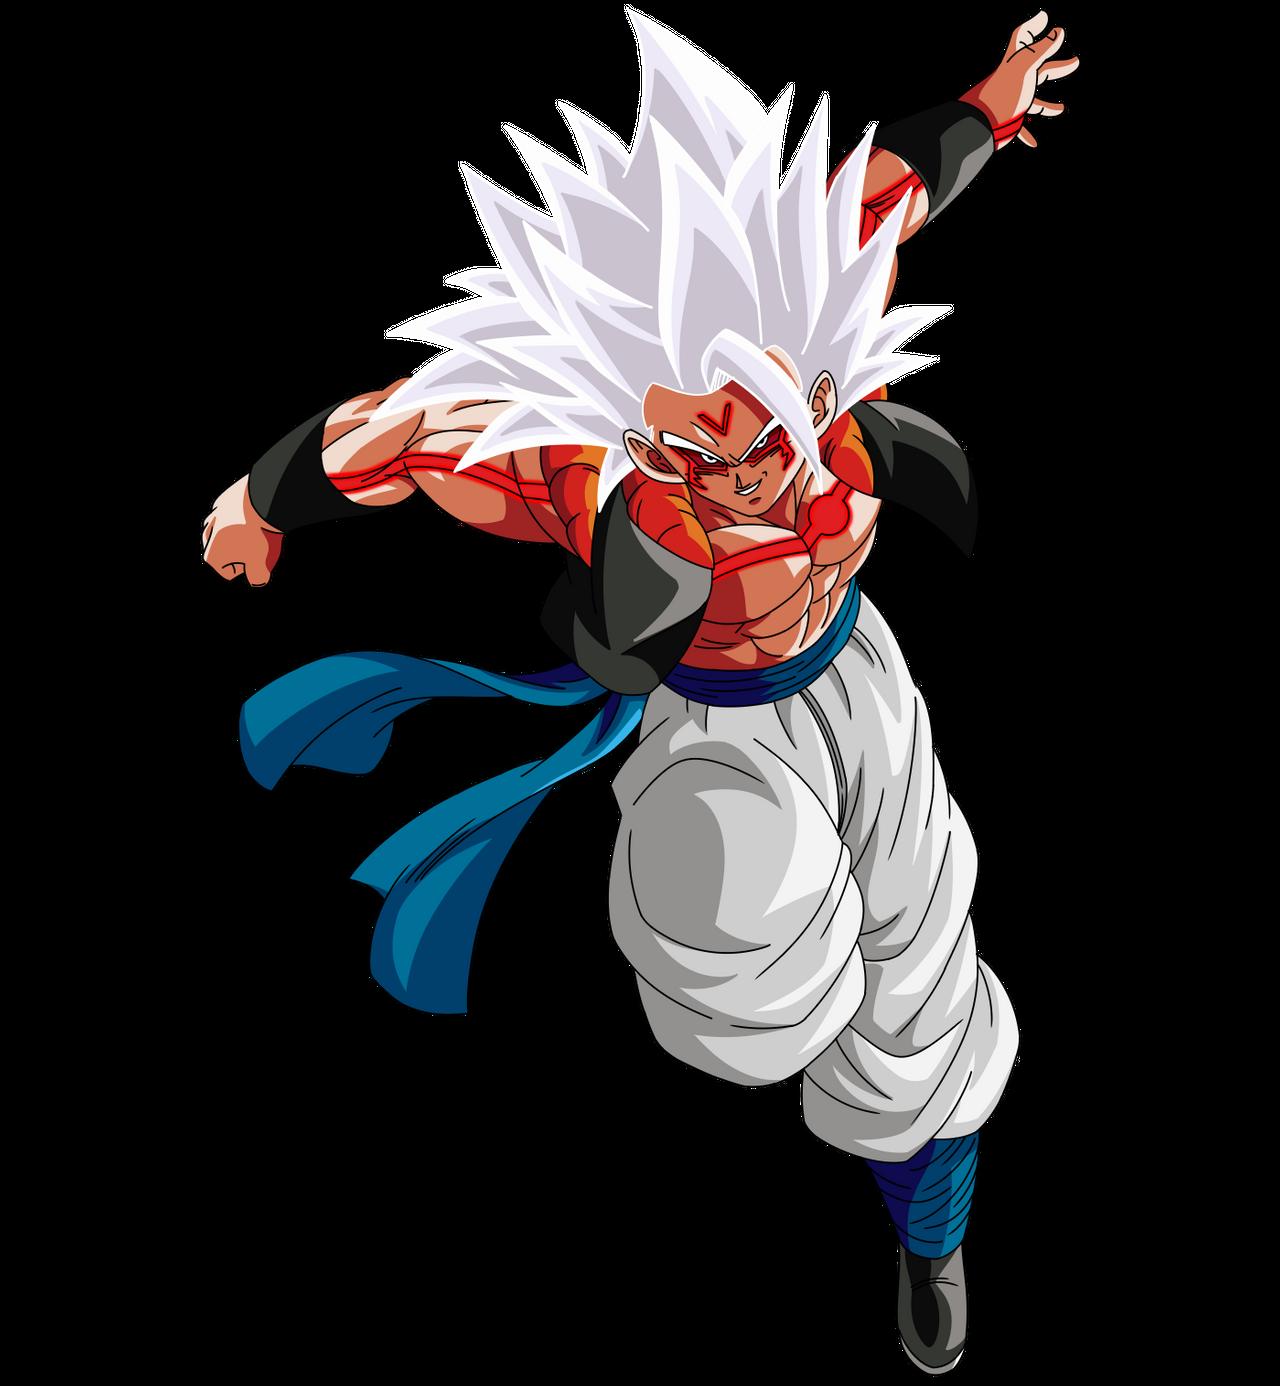 Gogeta Ssj Omni God By Ivansalina On Deviantart Dragon Ball Super Art Anime Dragon Ball Super Dragon Ball Art